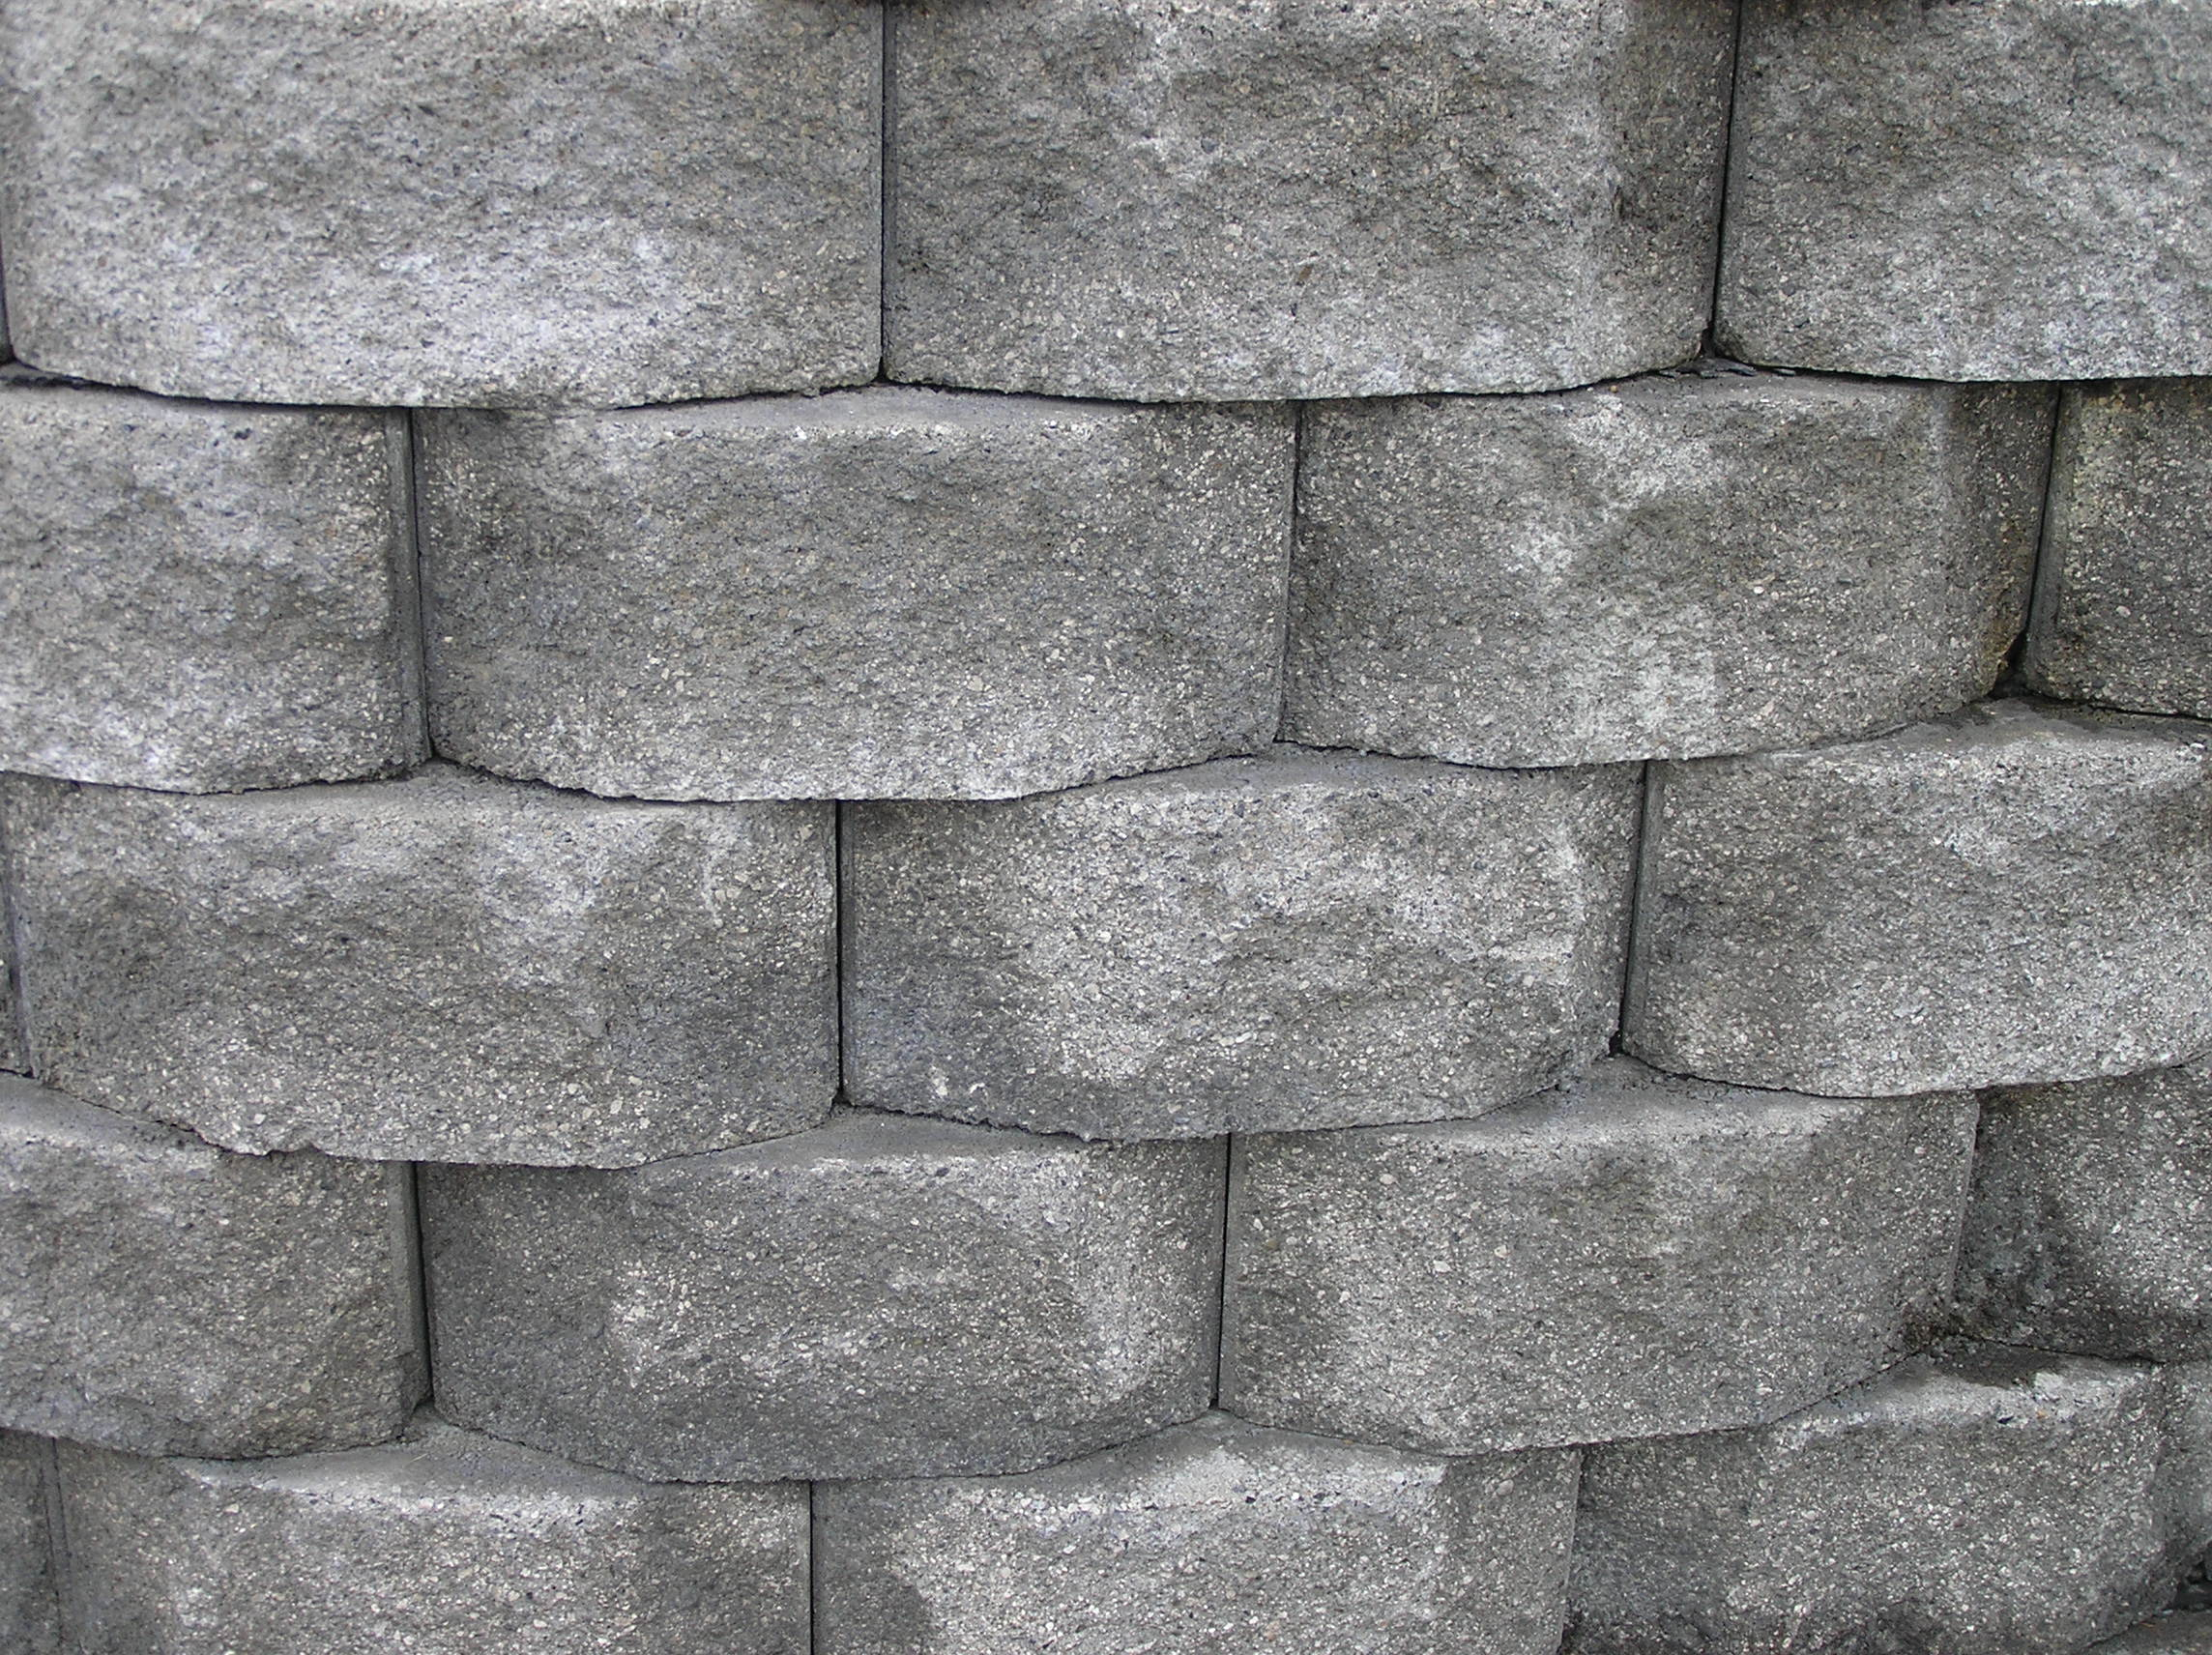 Photo Of Concrete Blocks